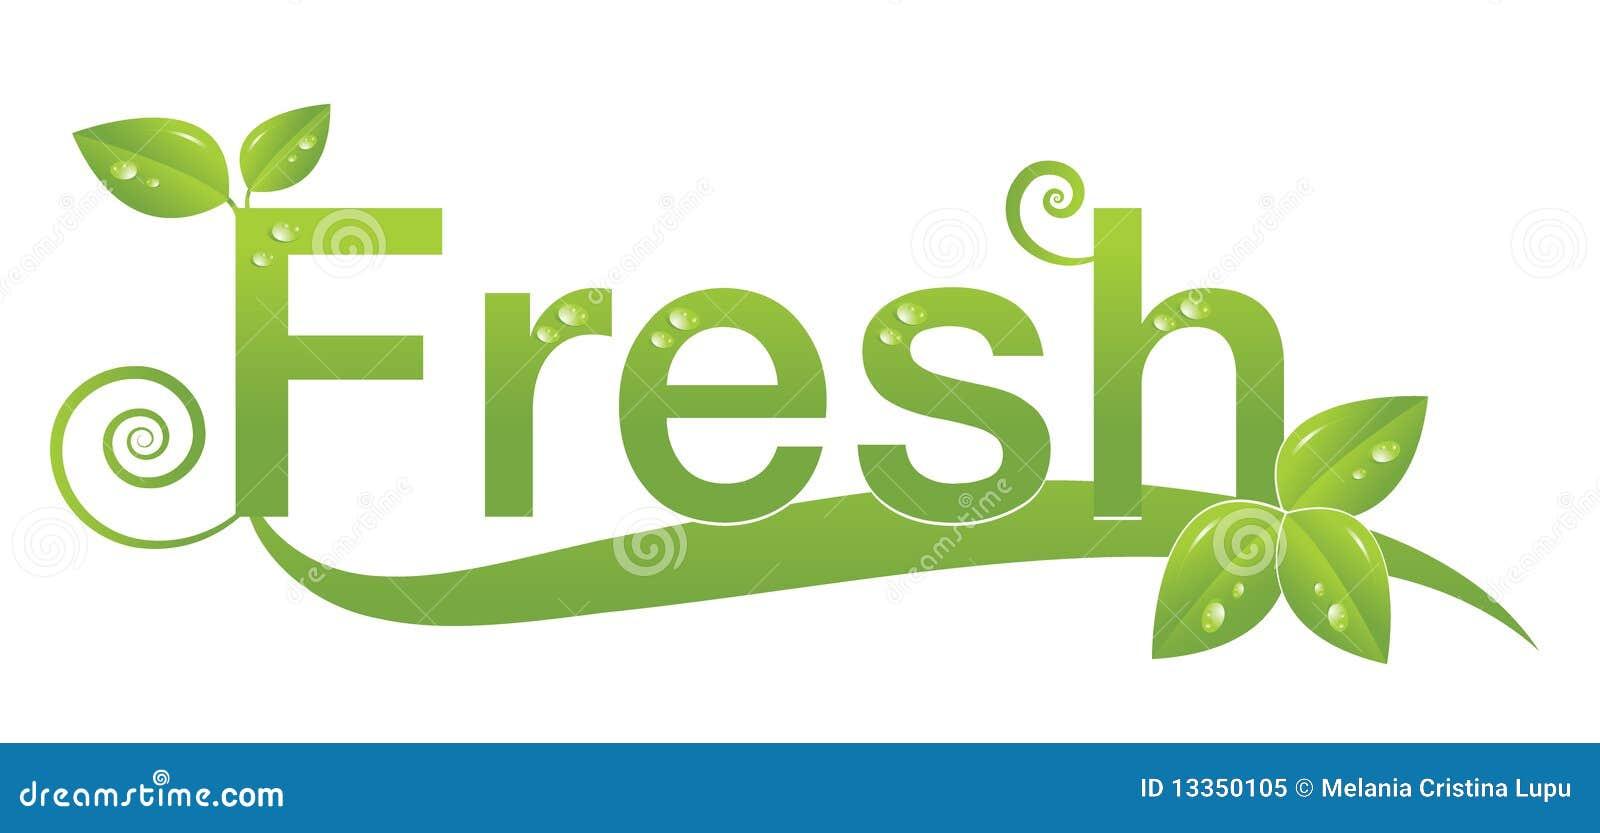 fresh logo design royalty free stock photo image 13350105